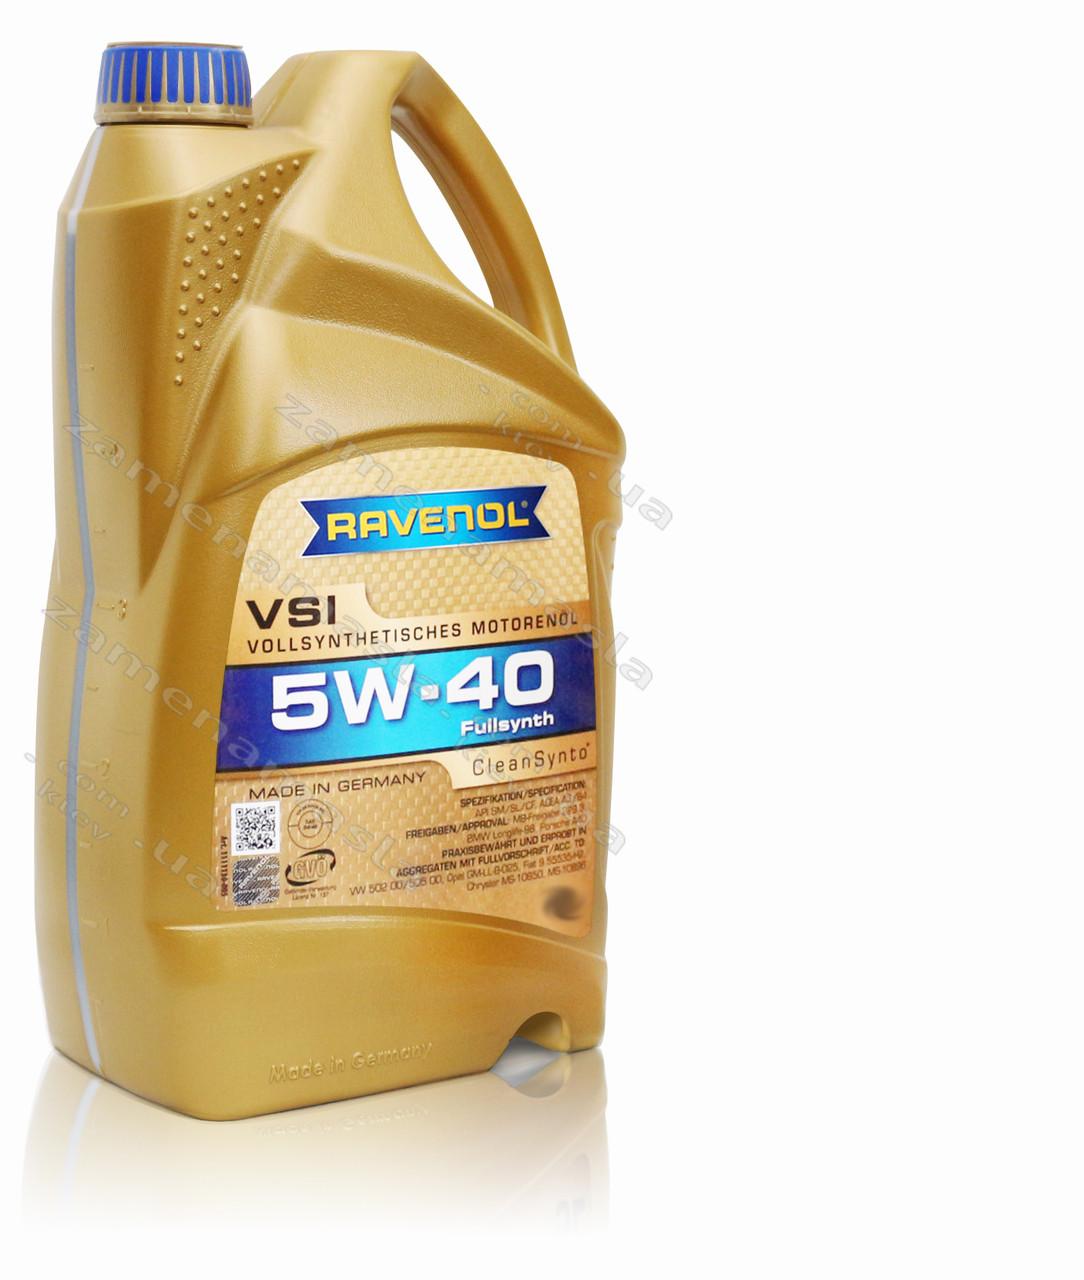 Ravenol VSI 5W-40 4л - моторное масло